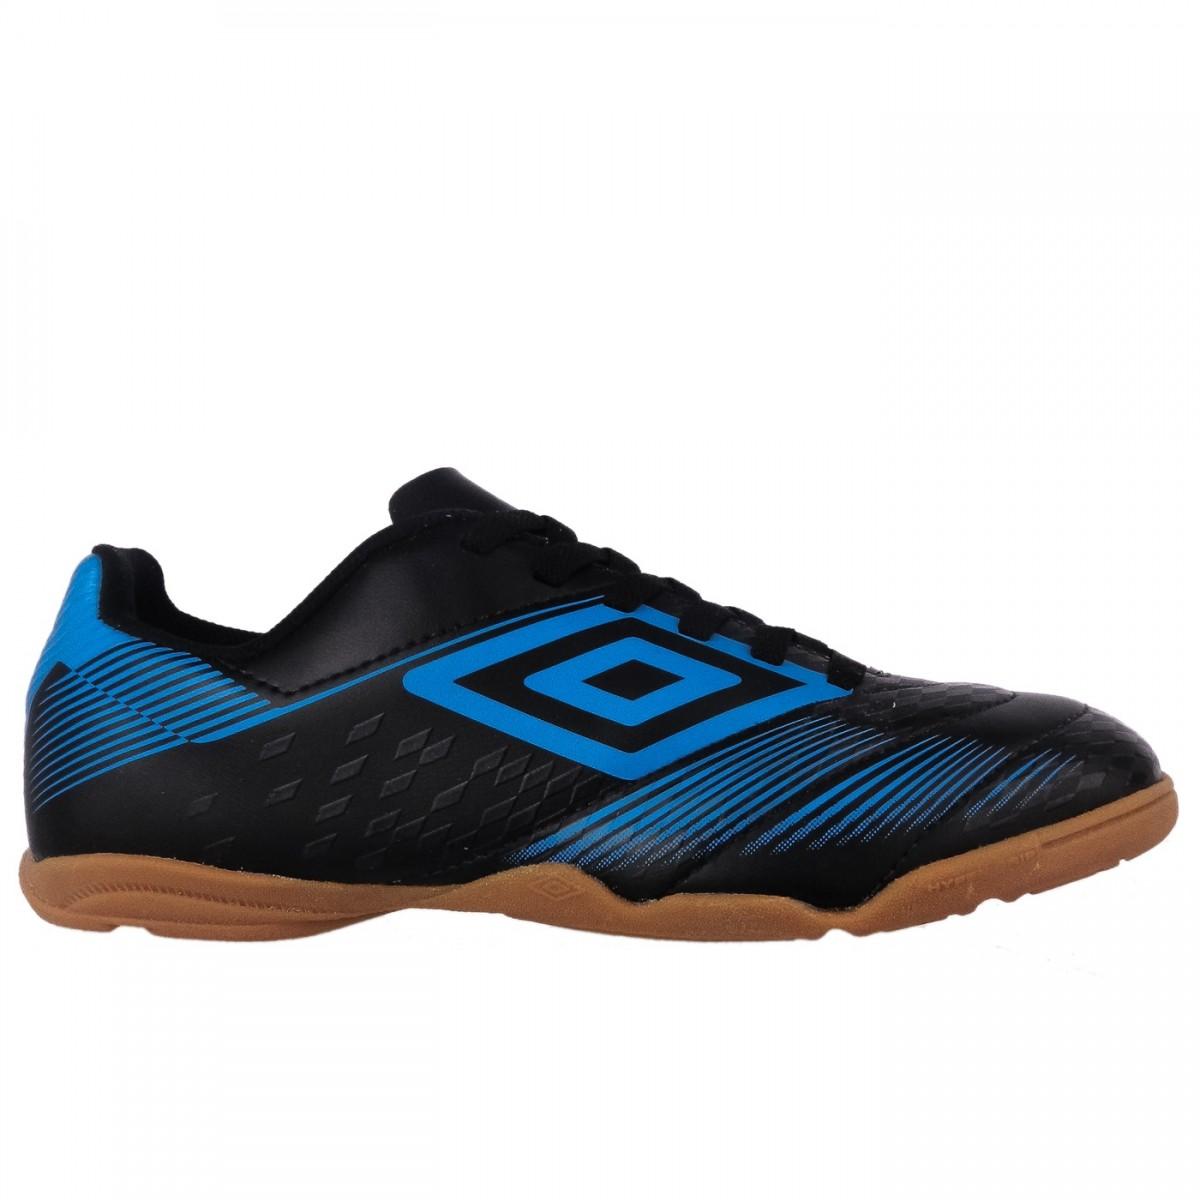 c8f76eb374 Bizz Store - Chuteira de Futsal Umbro Indoor Grass Masculina